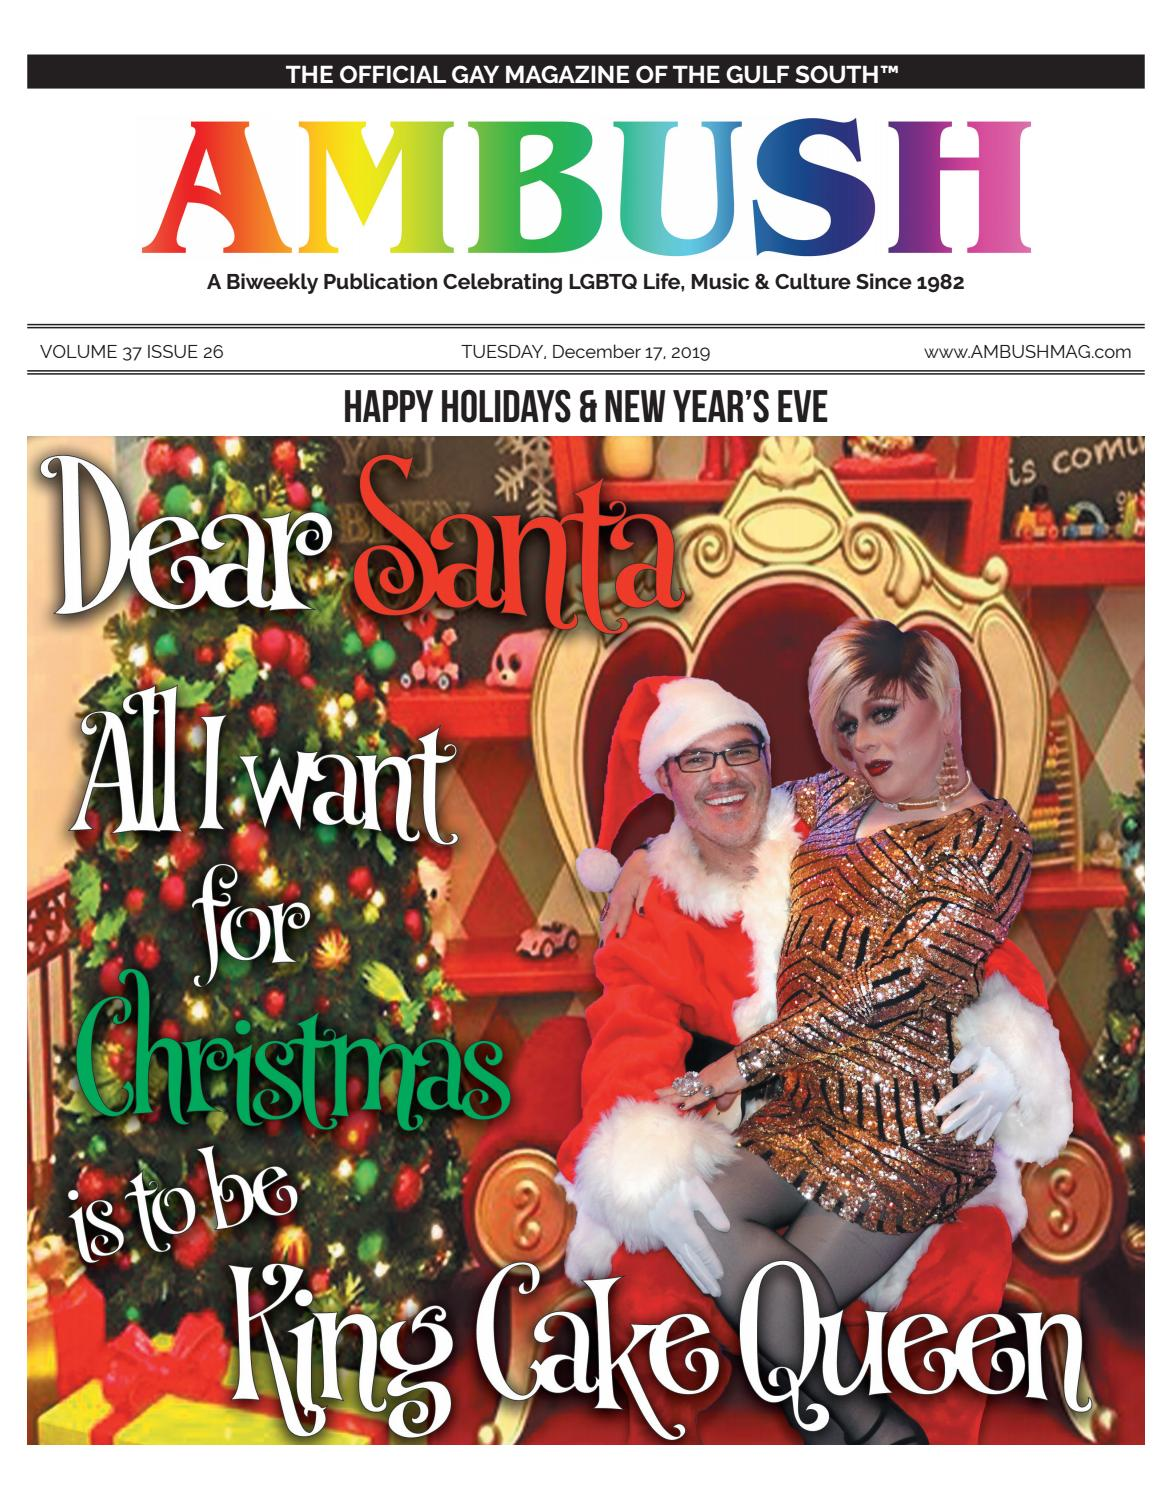 Branson Christmas Bus Tours From St Cloud Mn Leaving November 26 2020 Ambush Magazine Volume 37 Issue 26 by Ambush Publishing   issuu